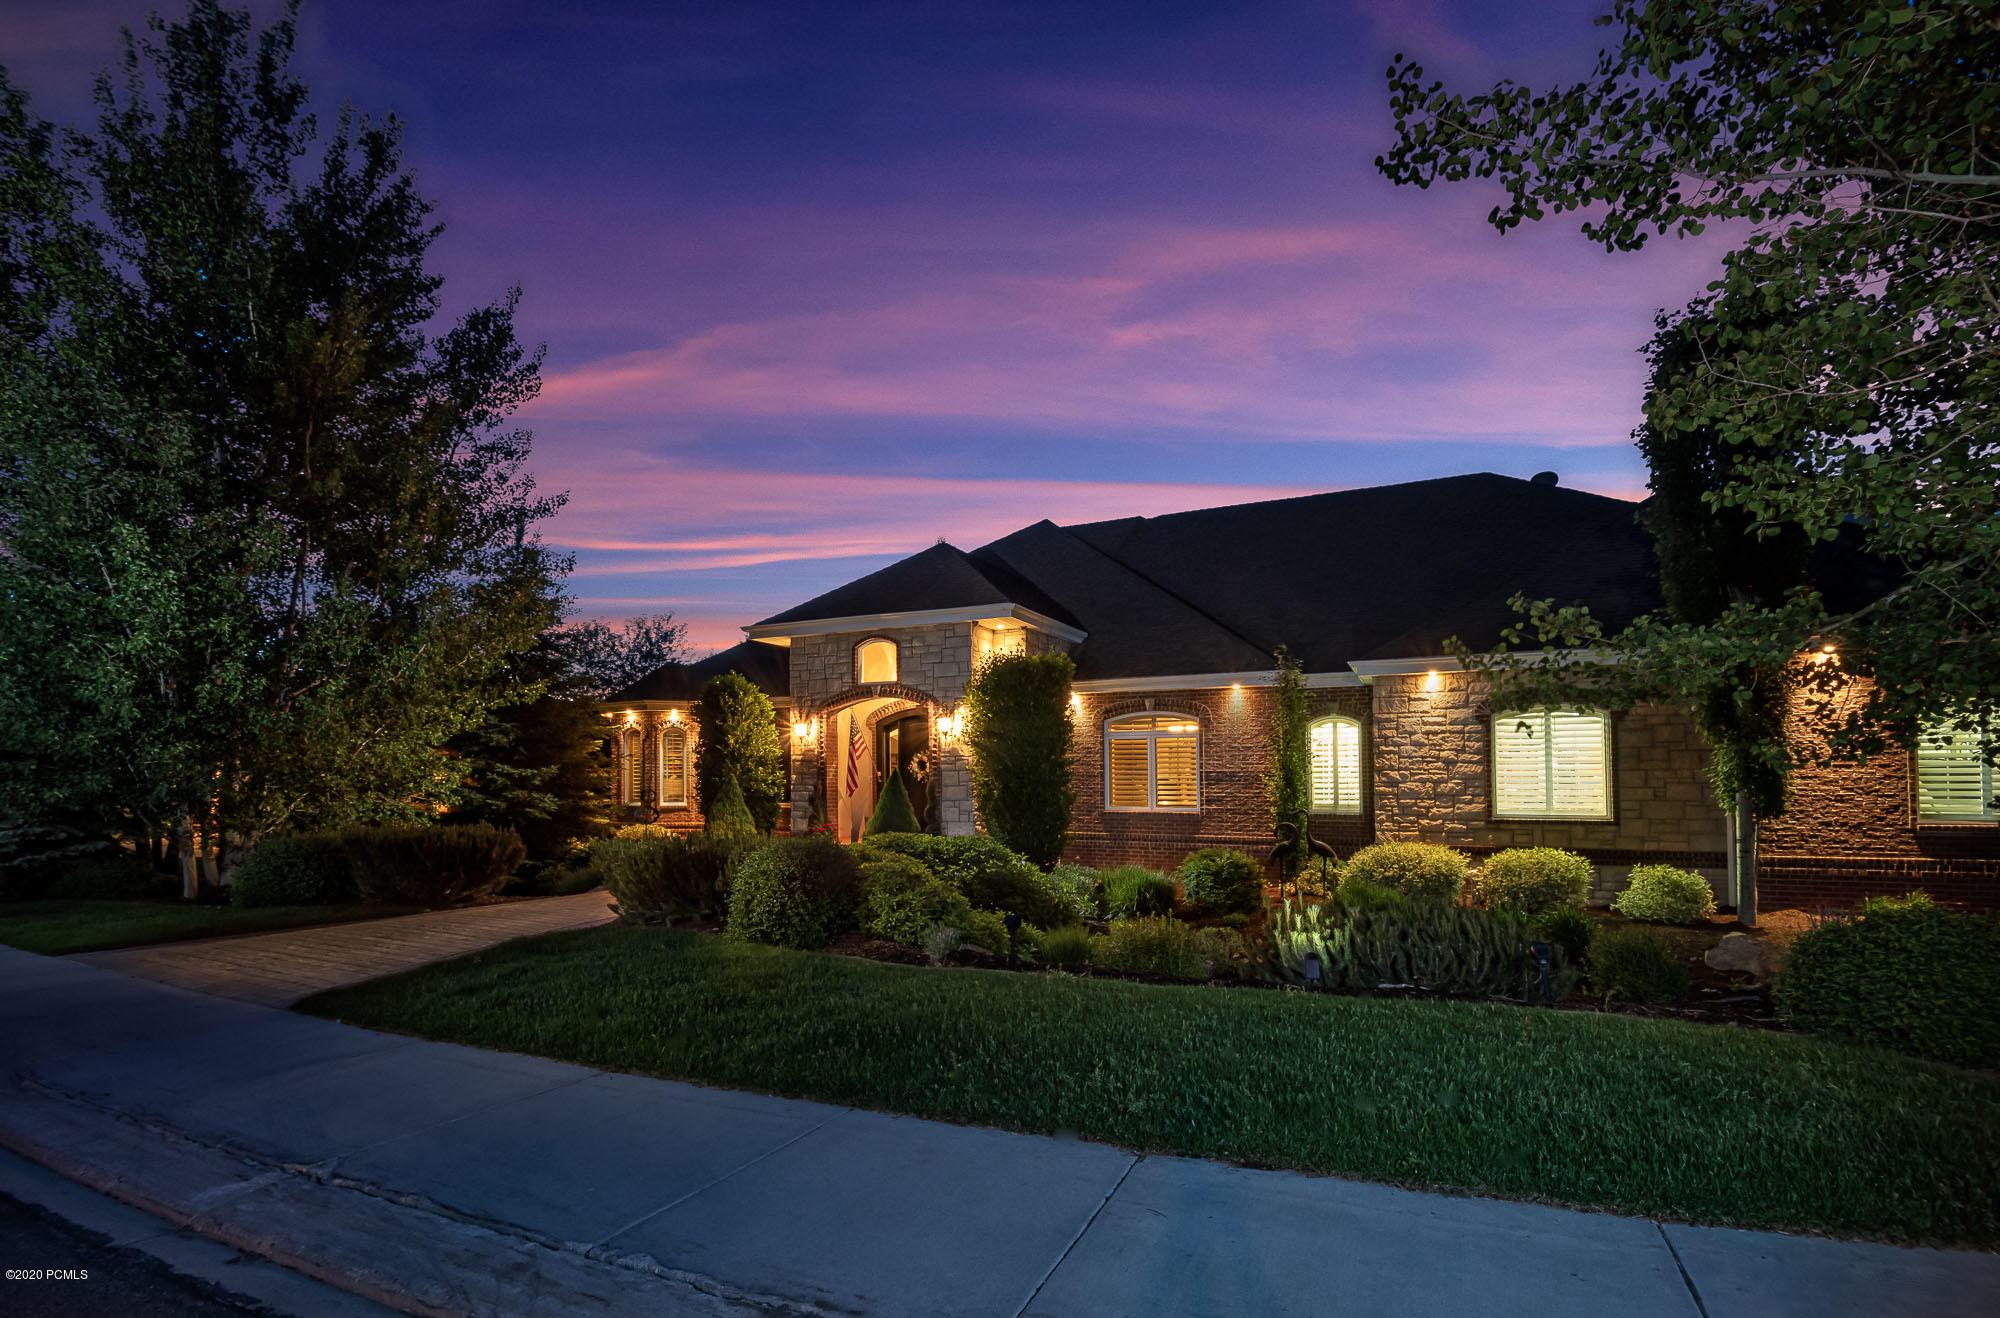 364 Tanner Lane, Midway, Utah 84049, 7 Bedrooms Bedrooms, ,8 BathroomsBathrooms,Single Family,For Sale,Tanner,12003951